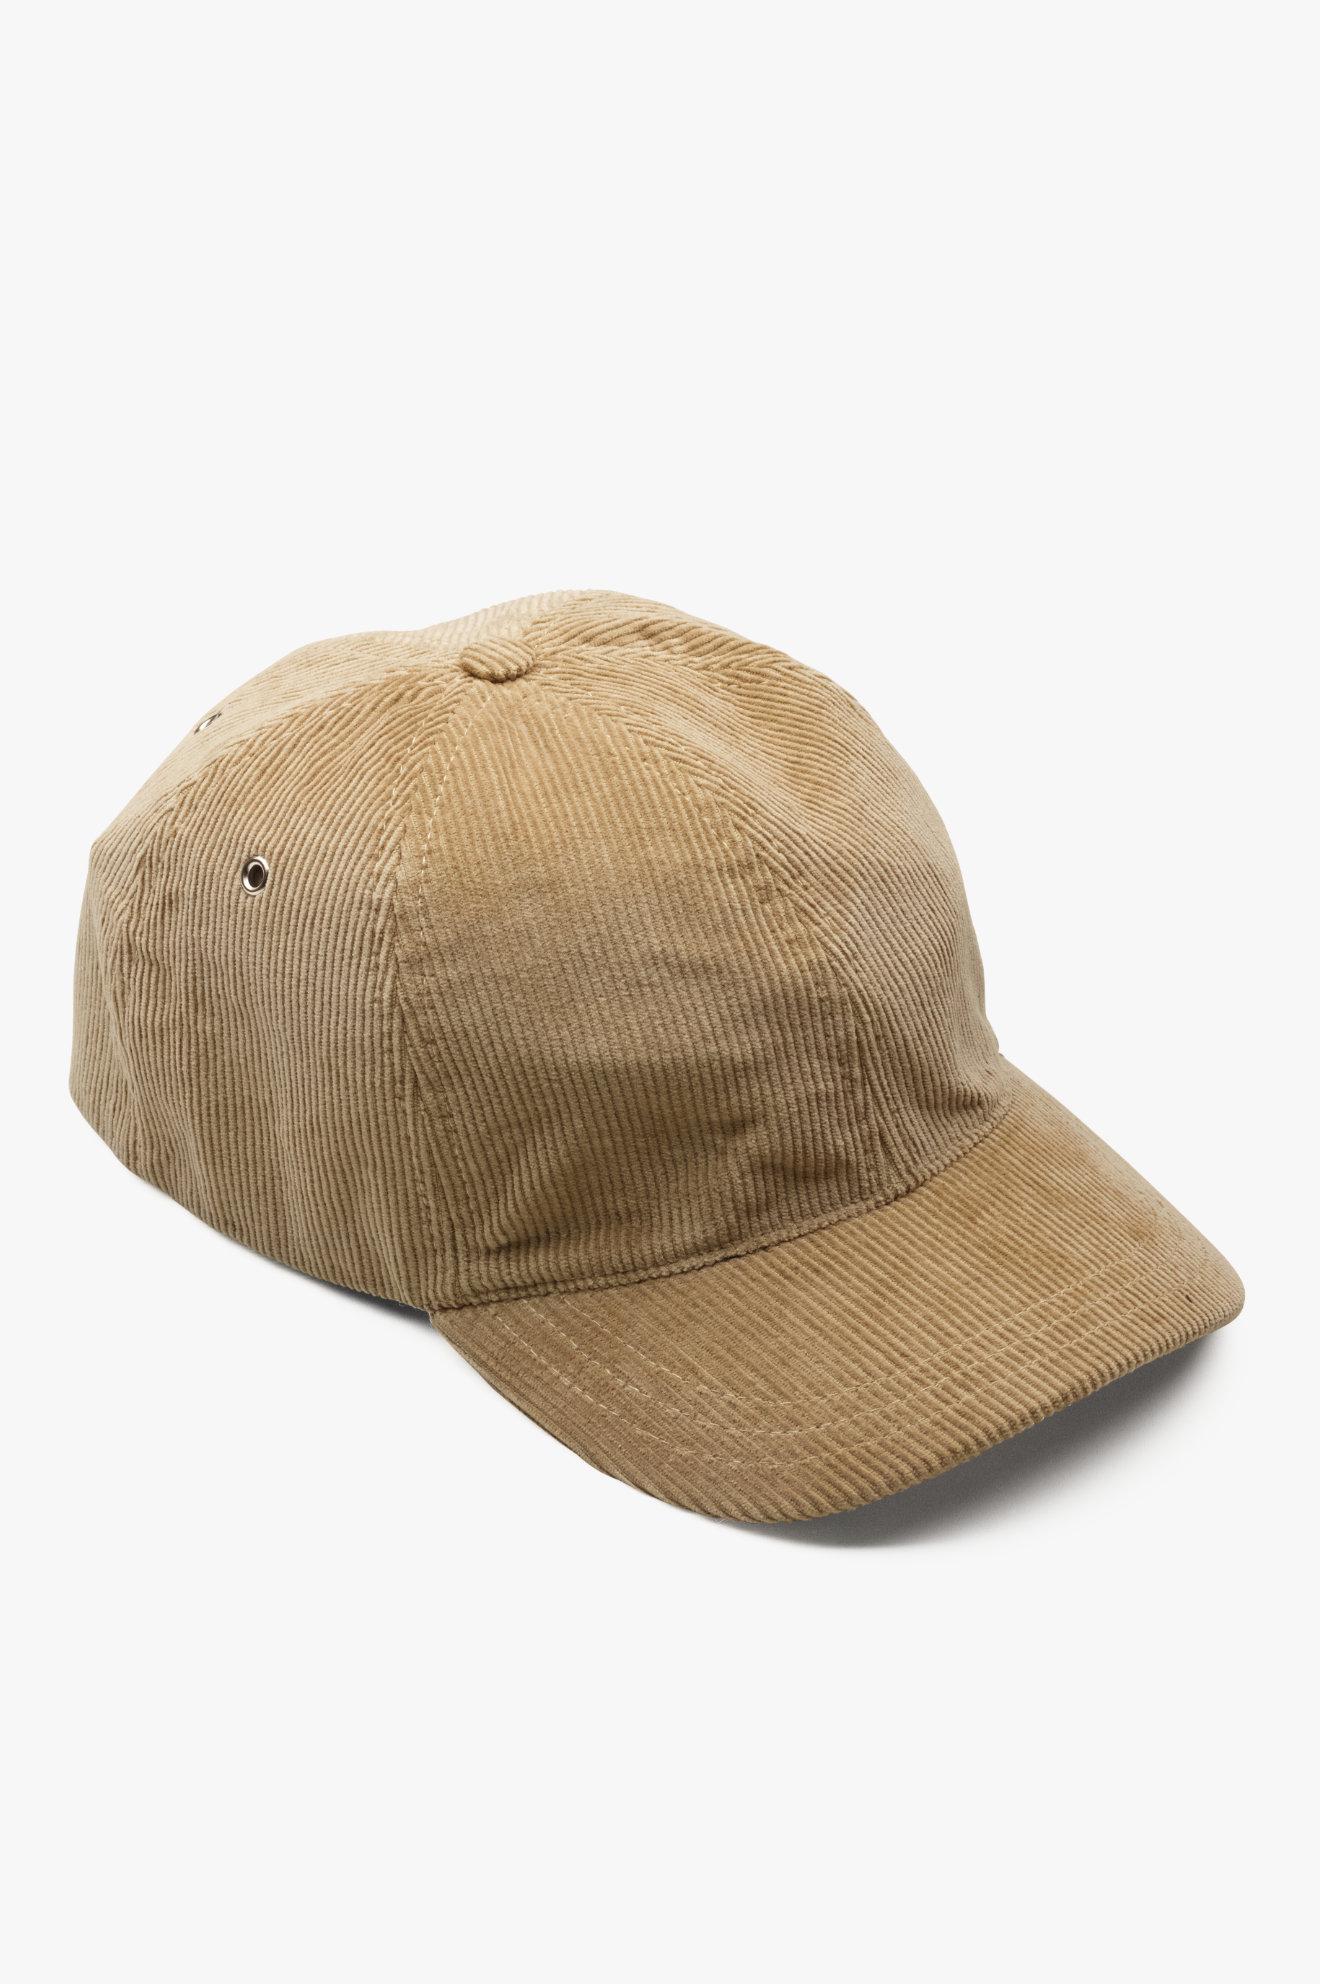 Louis Baseball Cap Beige